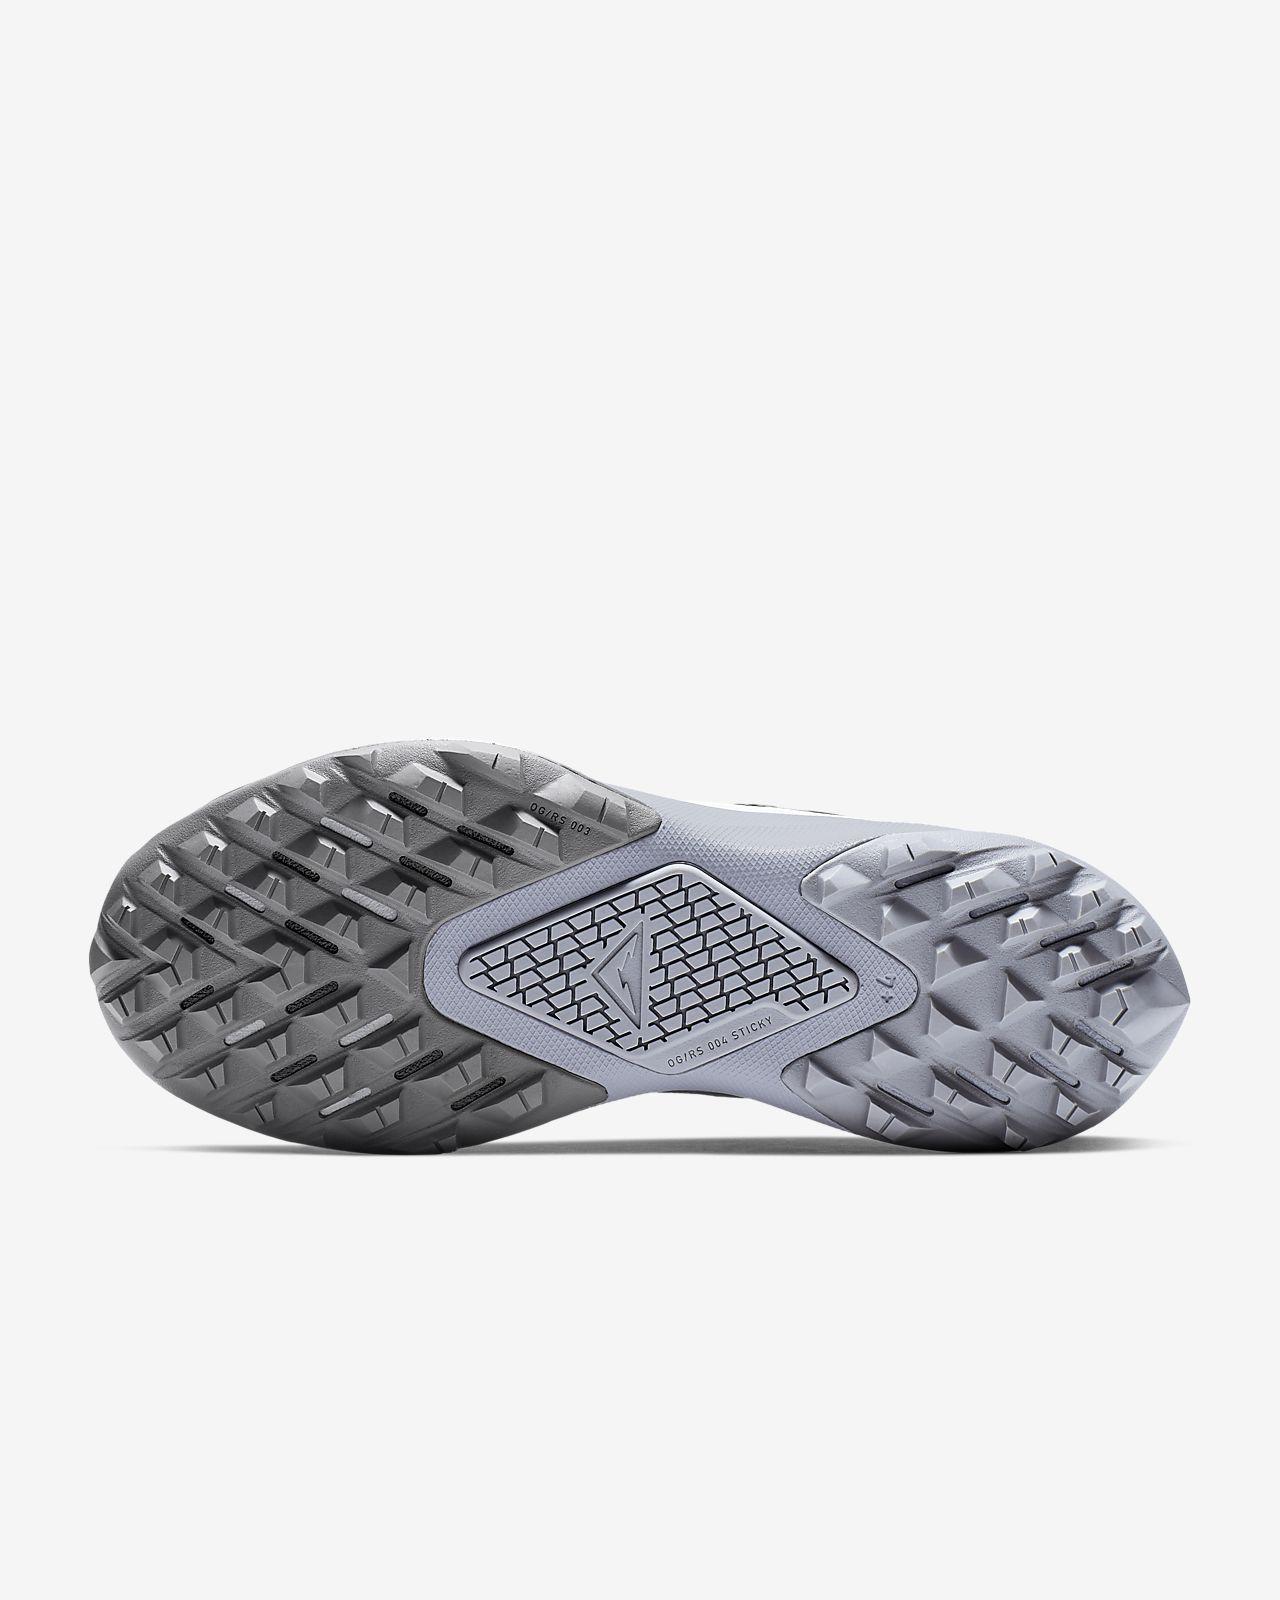 108892e3f1a9f Nike Air Zoom Terra Kiger 5 Women s Running Shoe. Nike.com